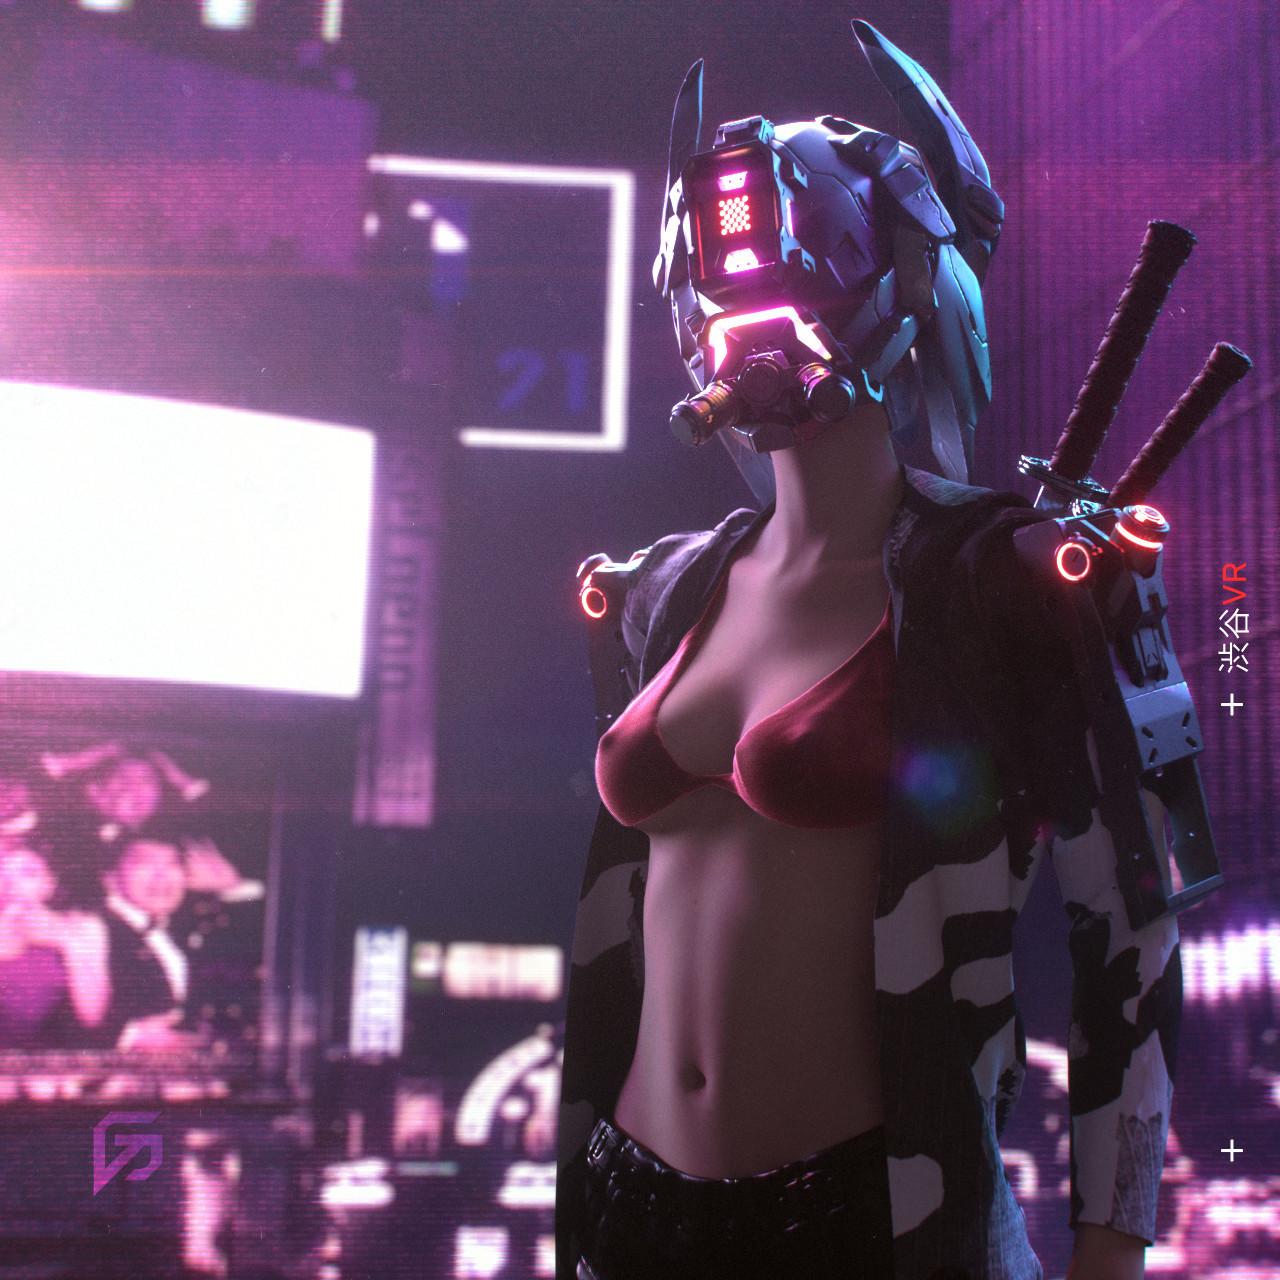 Gabriel Punsalang, gvokerart, киберпанк, cyberpunk, art, арт